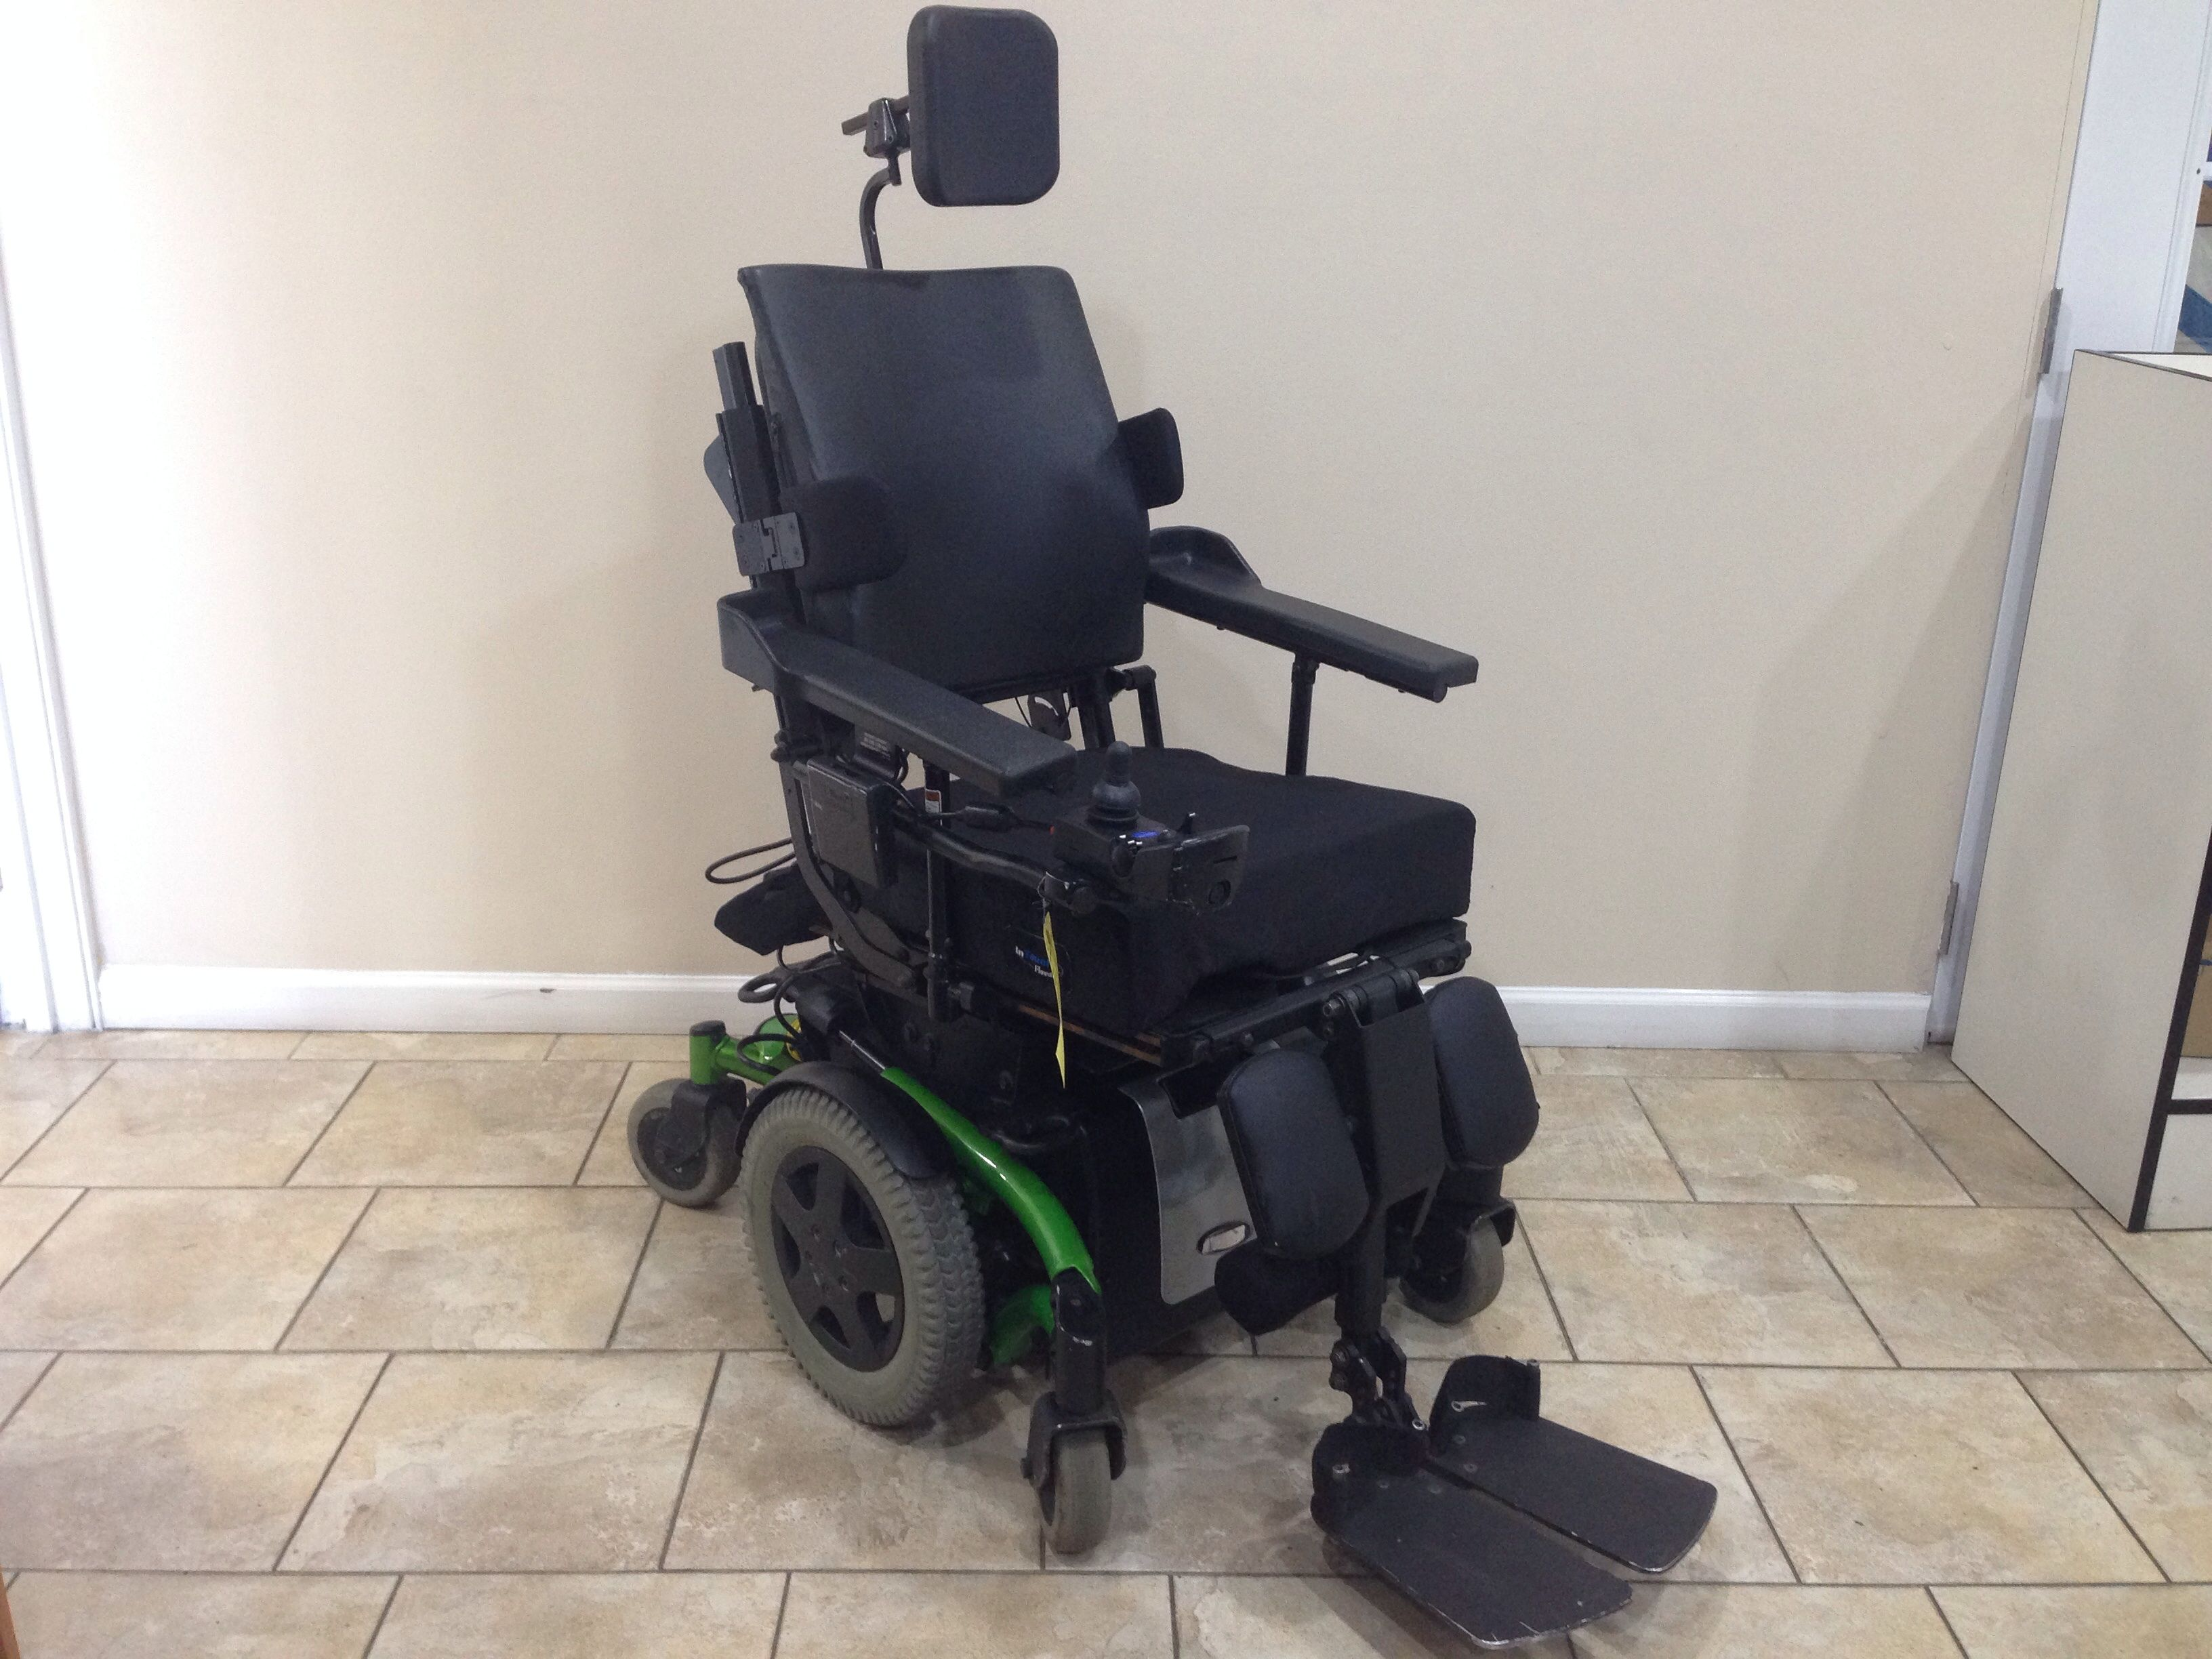 Pink electric wheelchair - Invacare Tdx Sp Rehab Power Tilt Recline Elevating Legrest Power Chair Http Wheelchairs